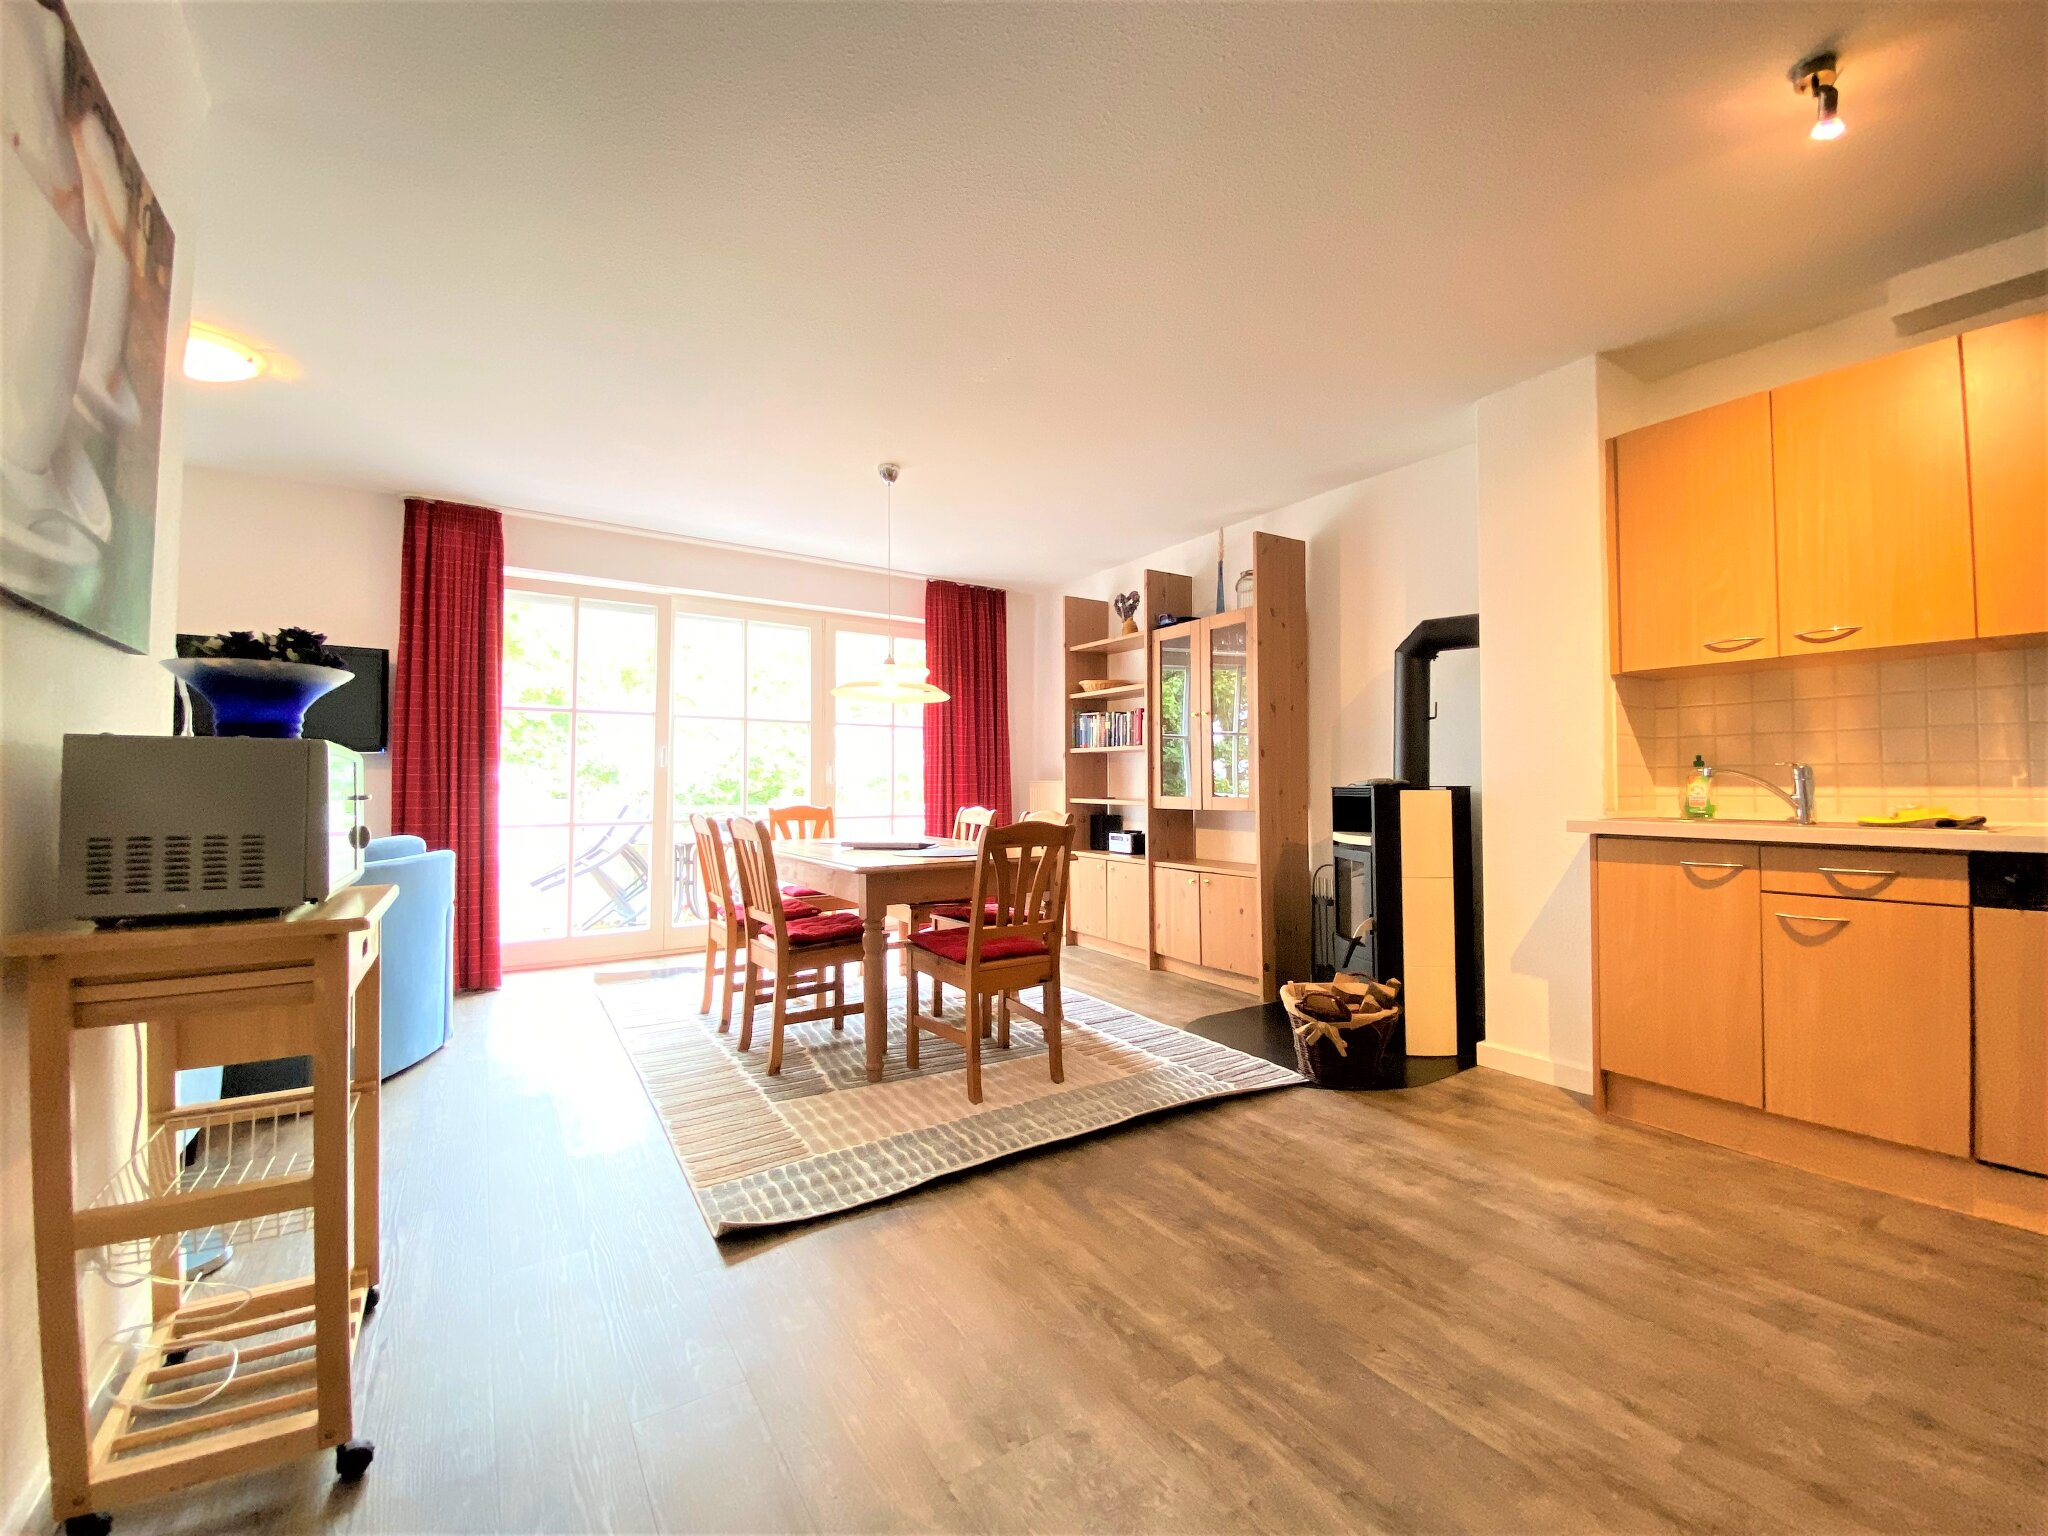 Apartmenthaus 'Am Nordseestrand' - Whg. 9